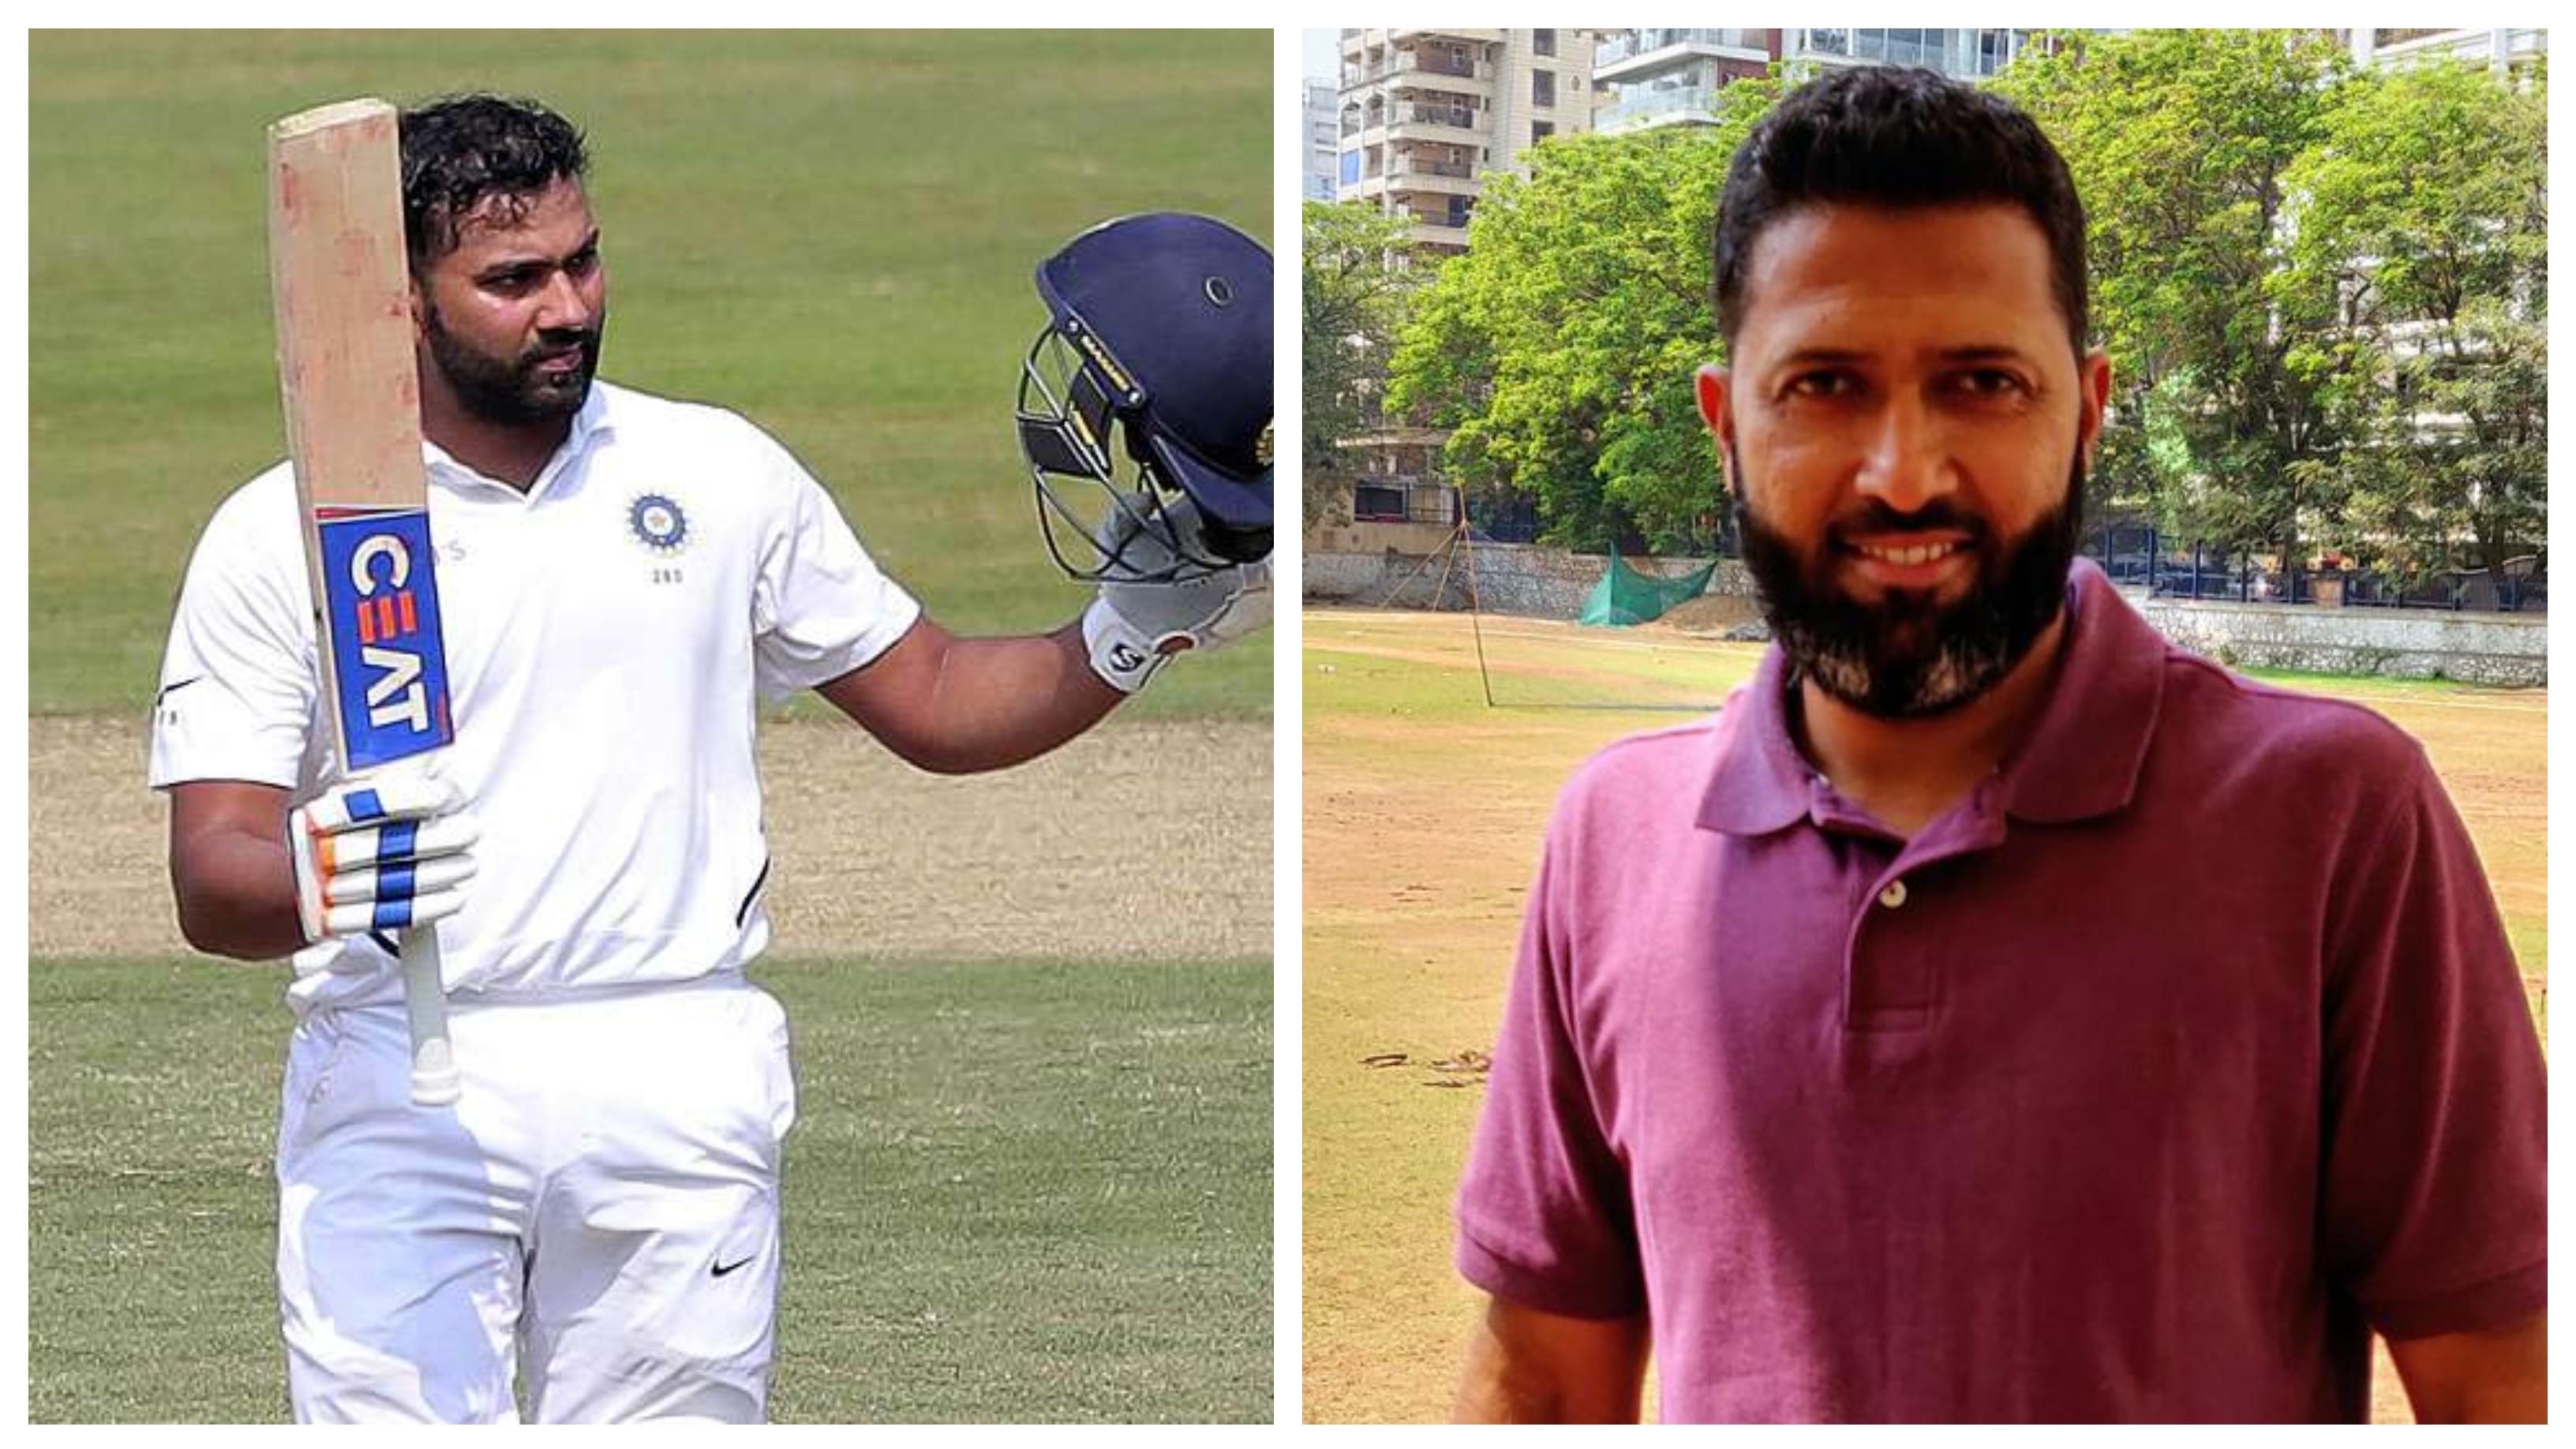 Wasim Jaffer lauds Rohit Sharma's maturity, backs him to score Test double tons overseas